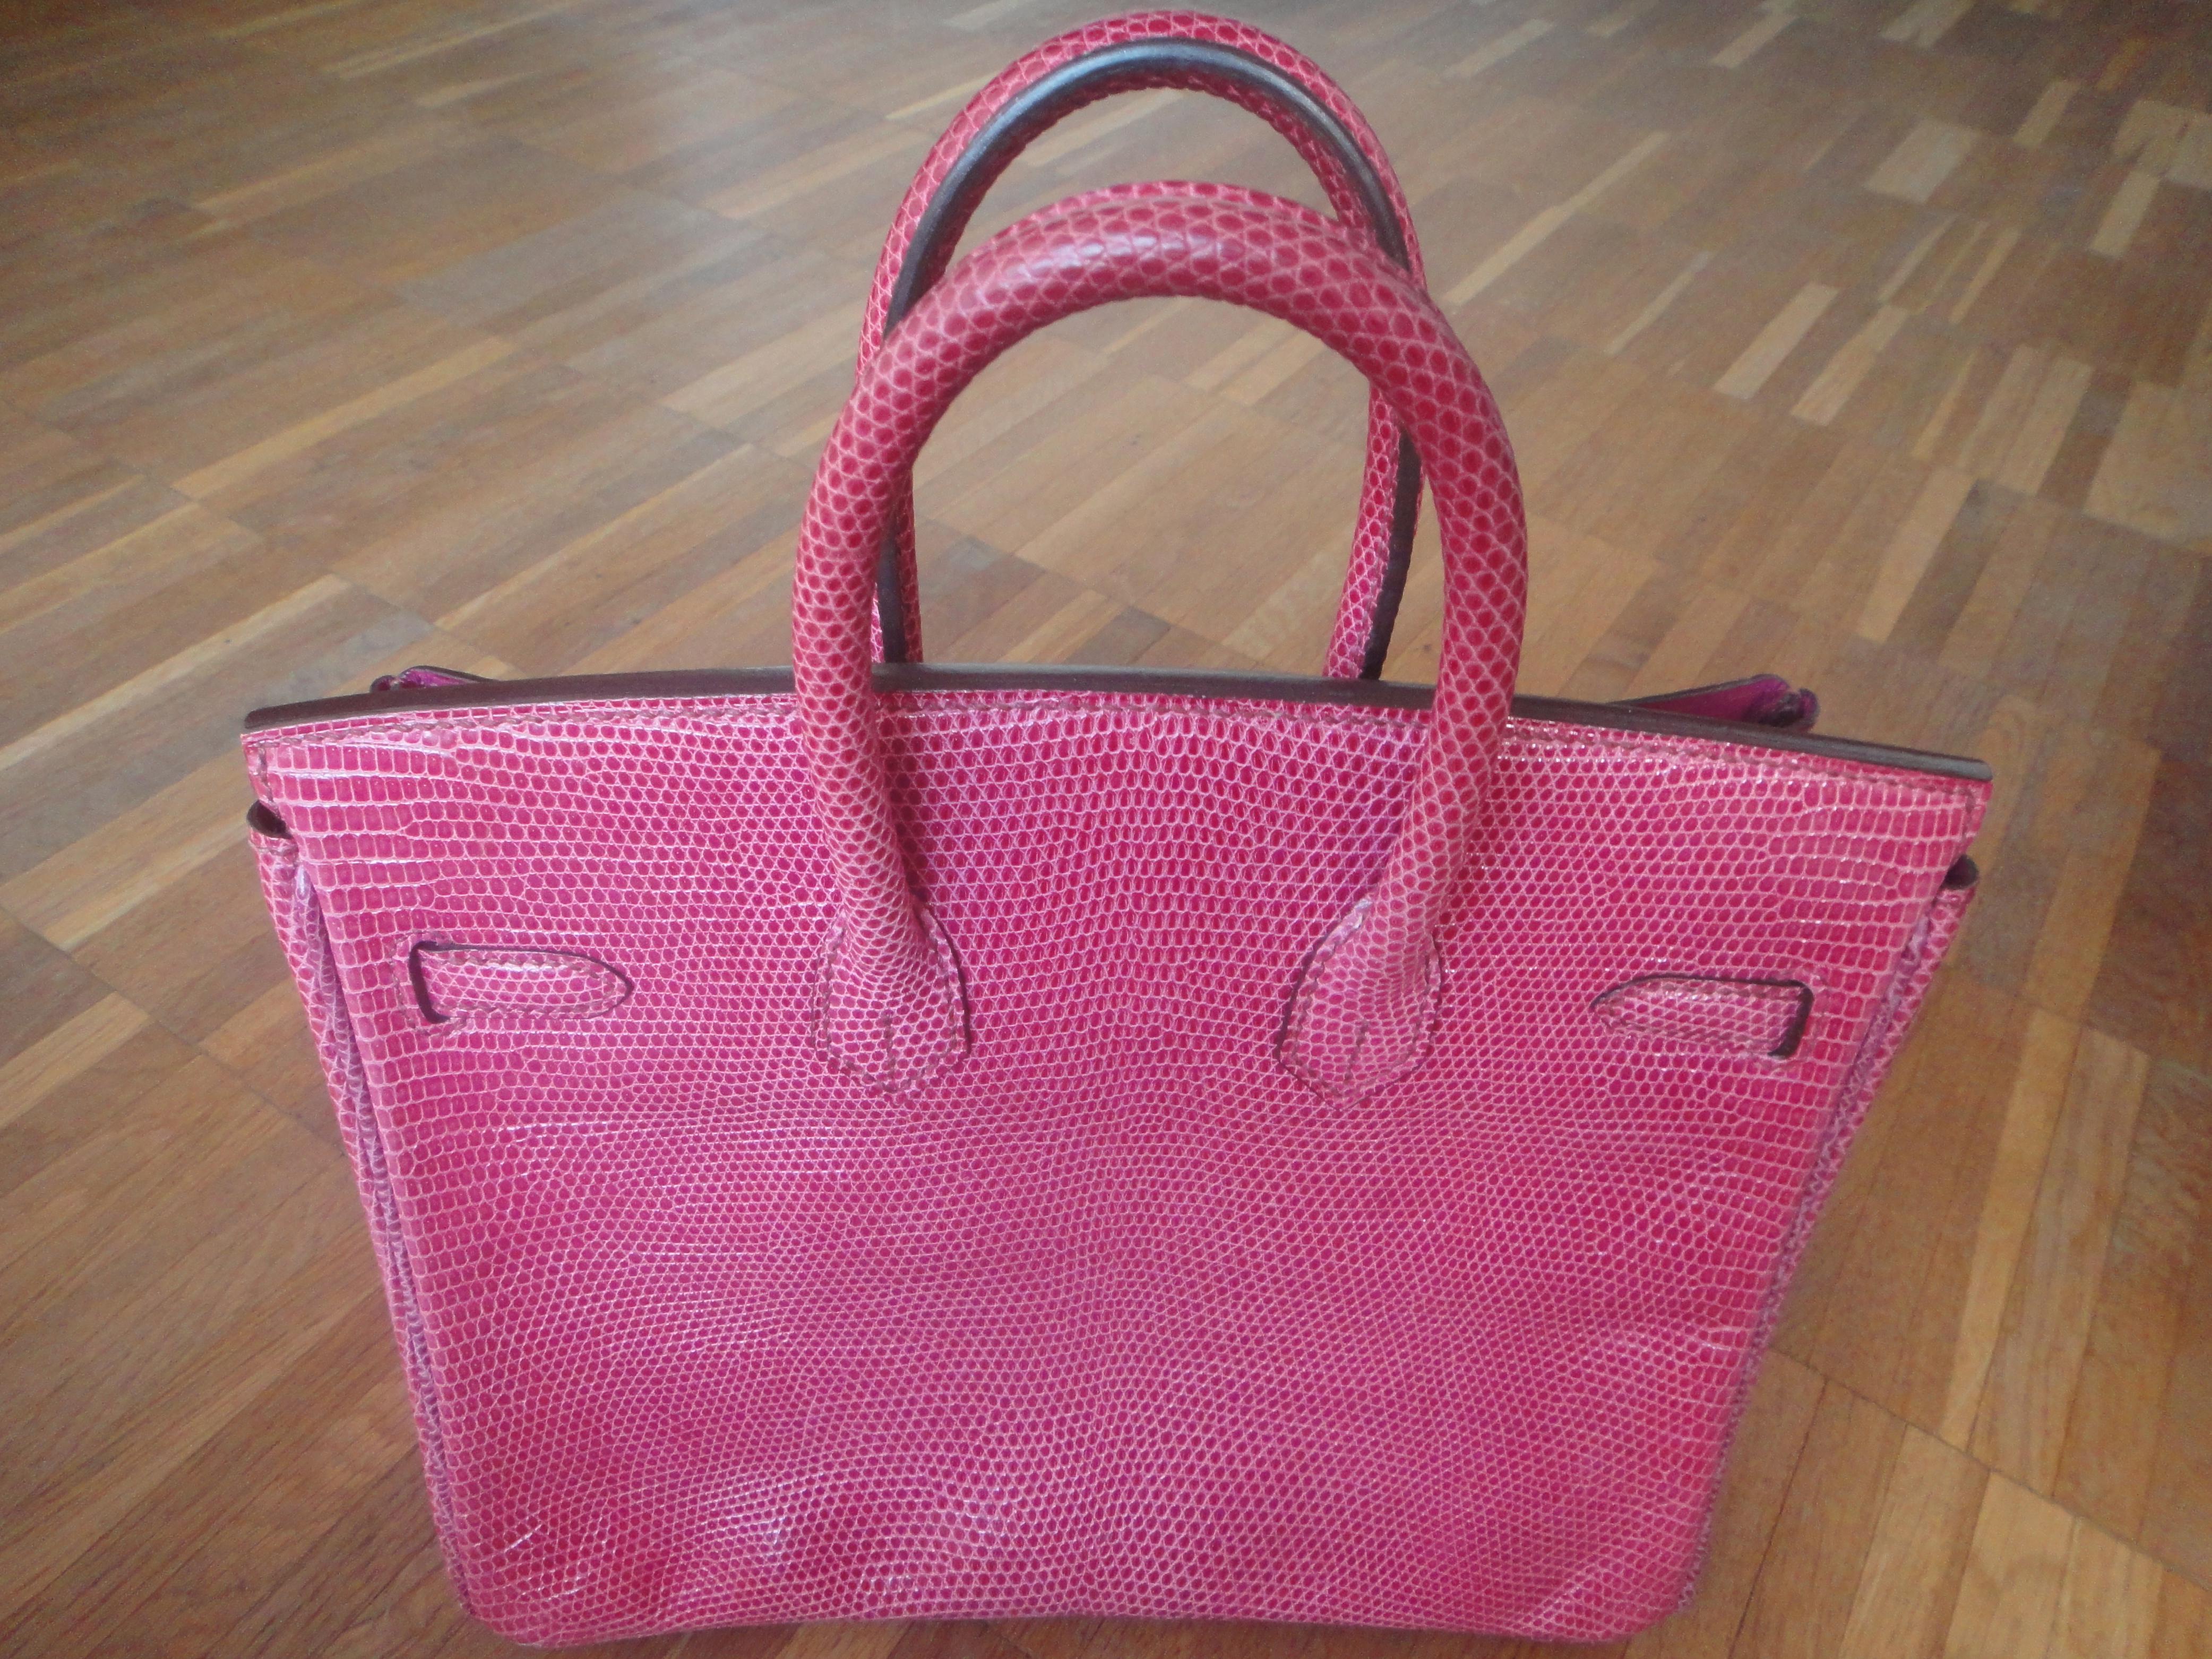 Hermès - Lady B. back side